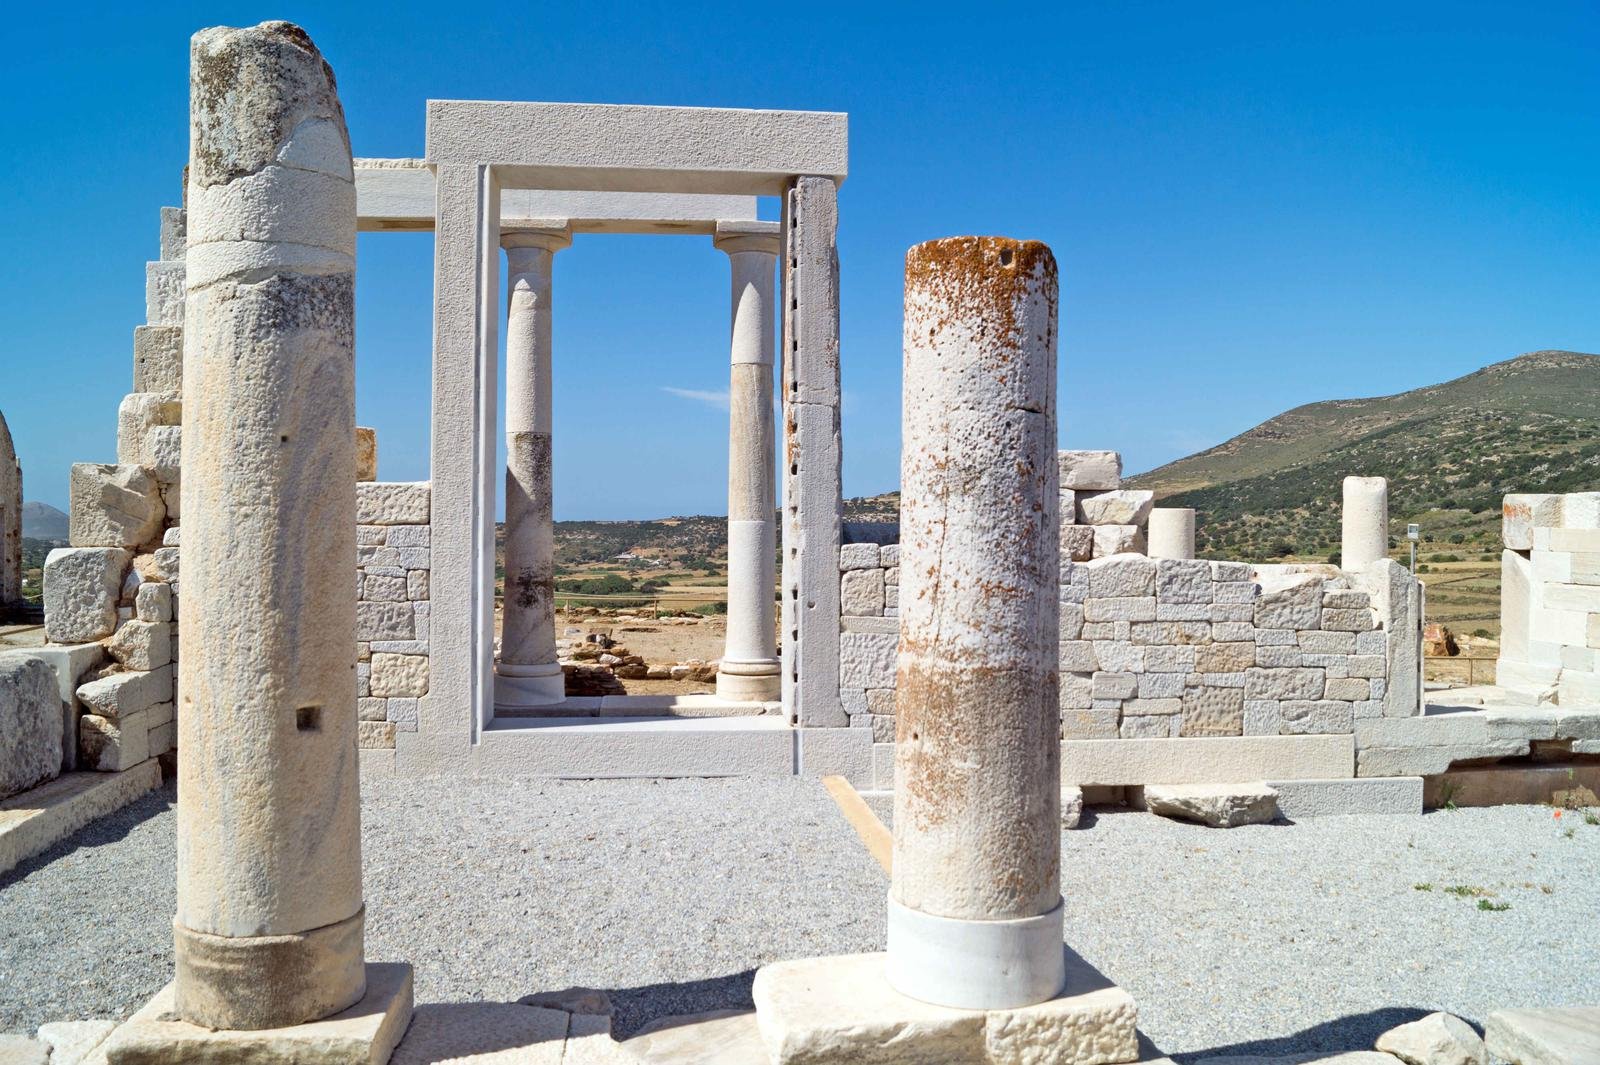 islas mediterraneo Naxos, Grecia